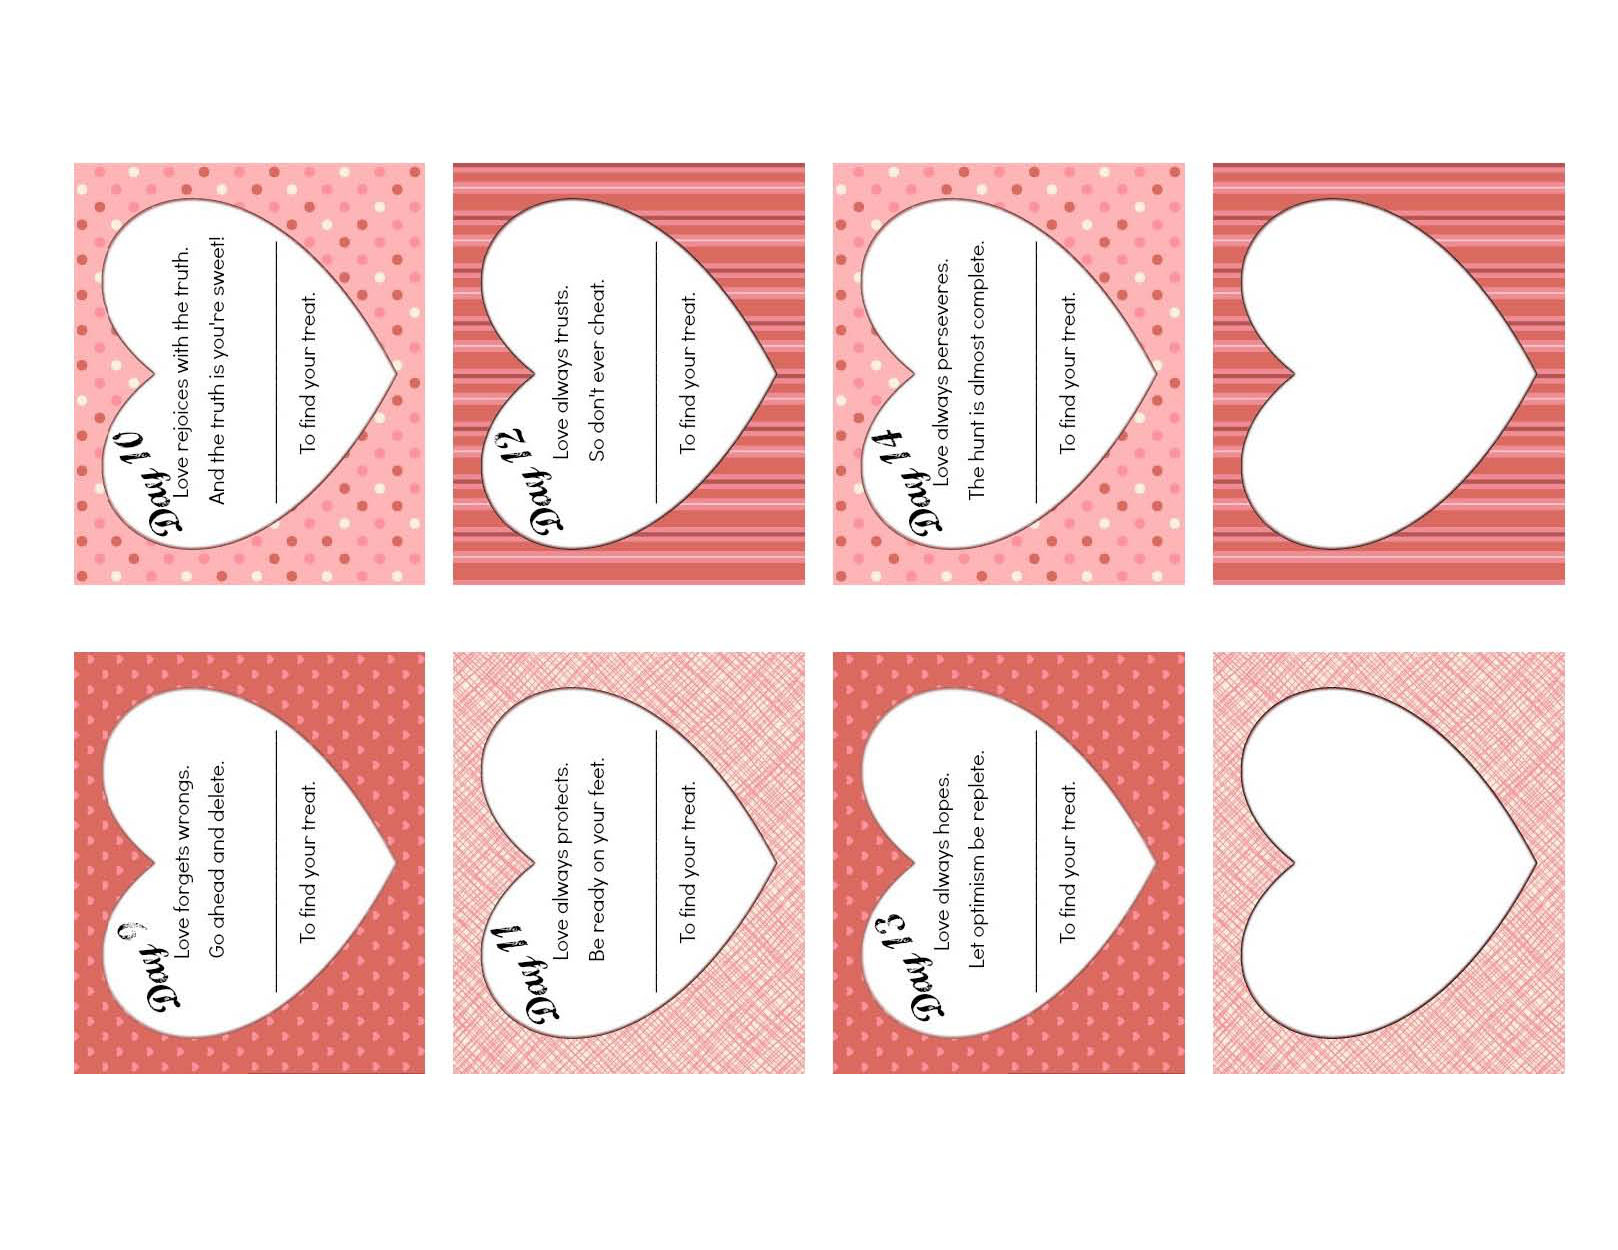 ... Valentineu0027s Day Countdown Clues 9 14